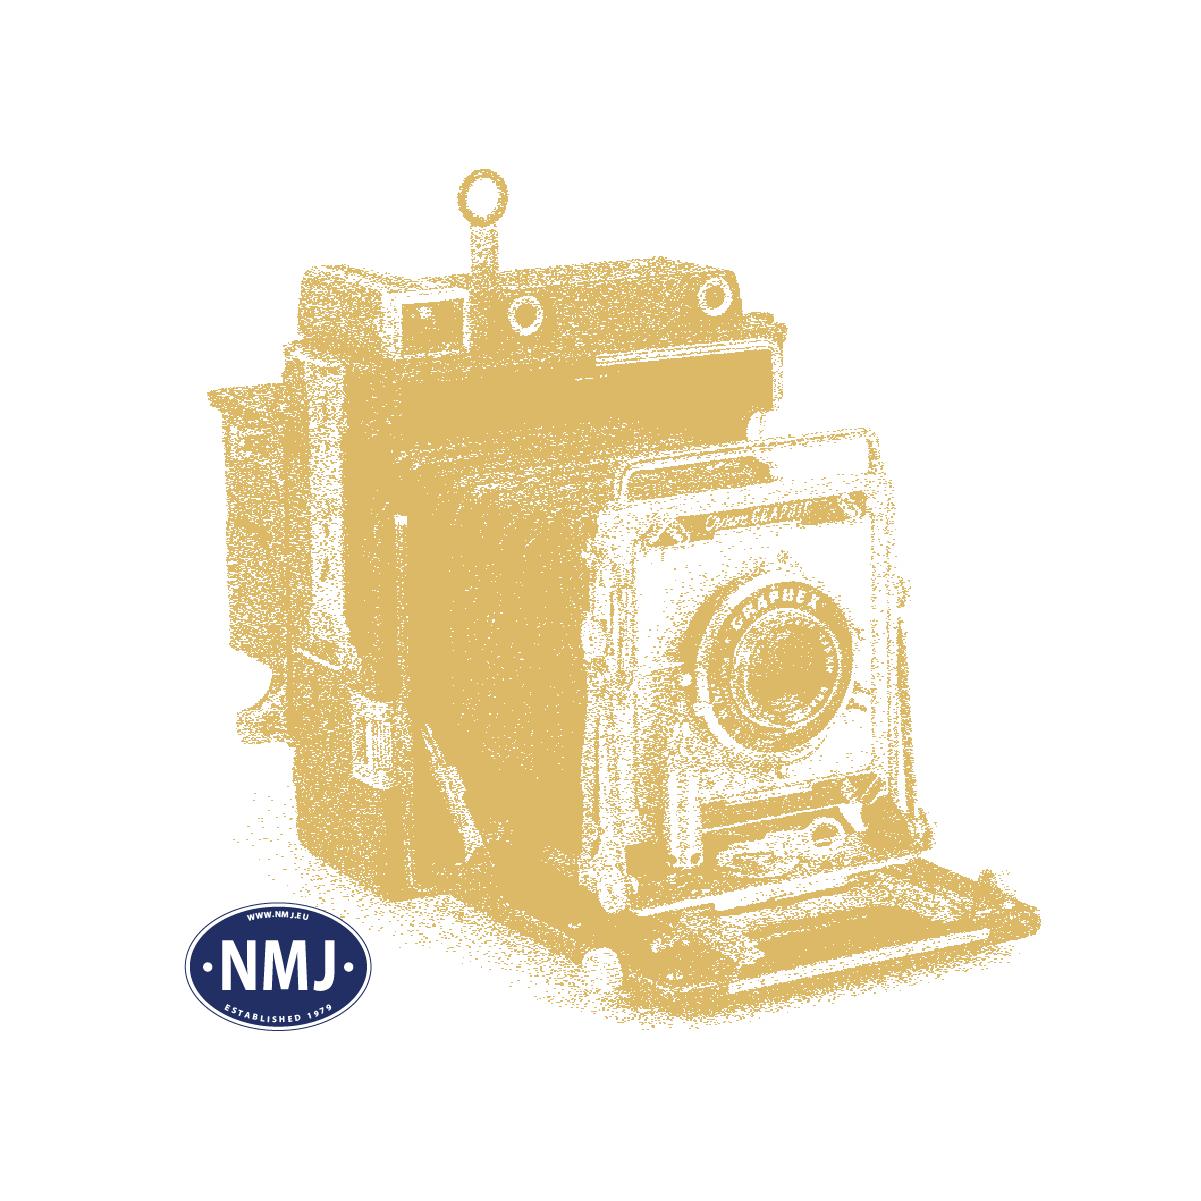 NOC15563 - Gatemusikanter